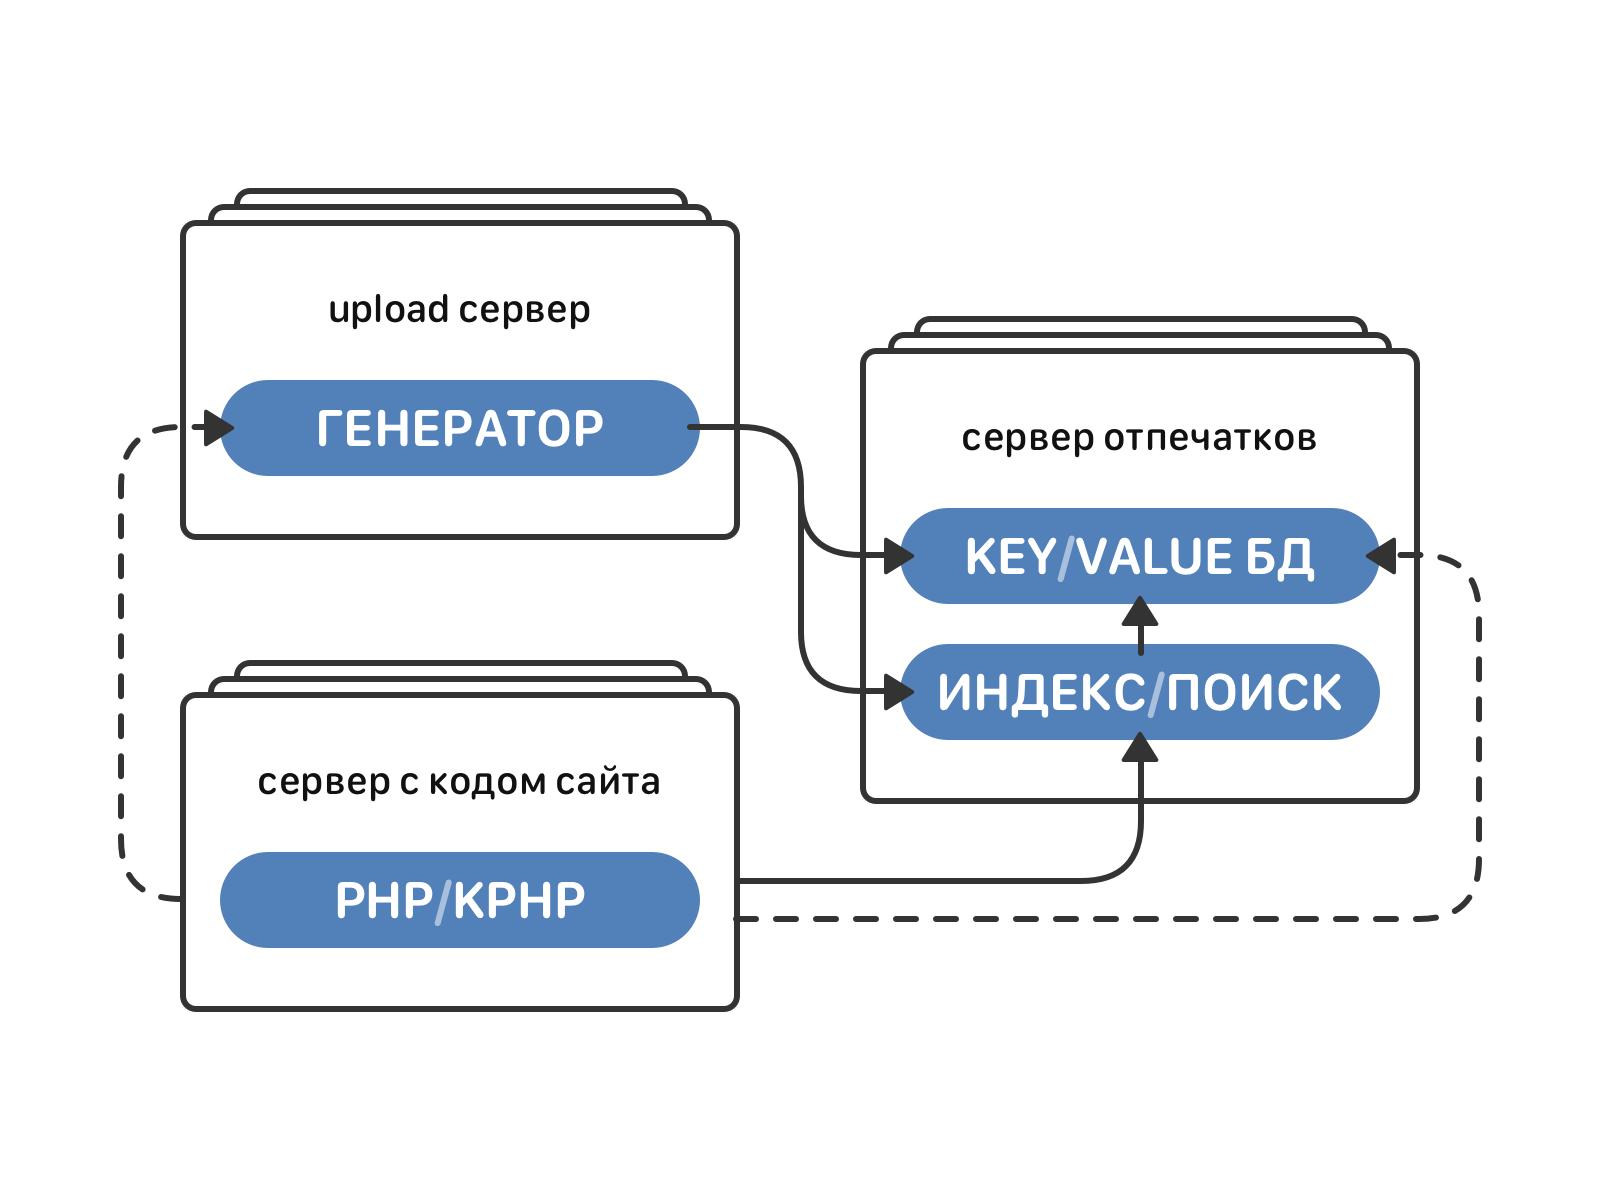 Архитектура и алгоритмы индексации аудиозаписей ВКонтакте - 10